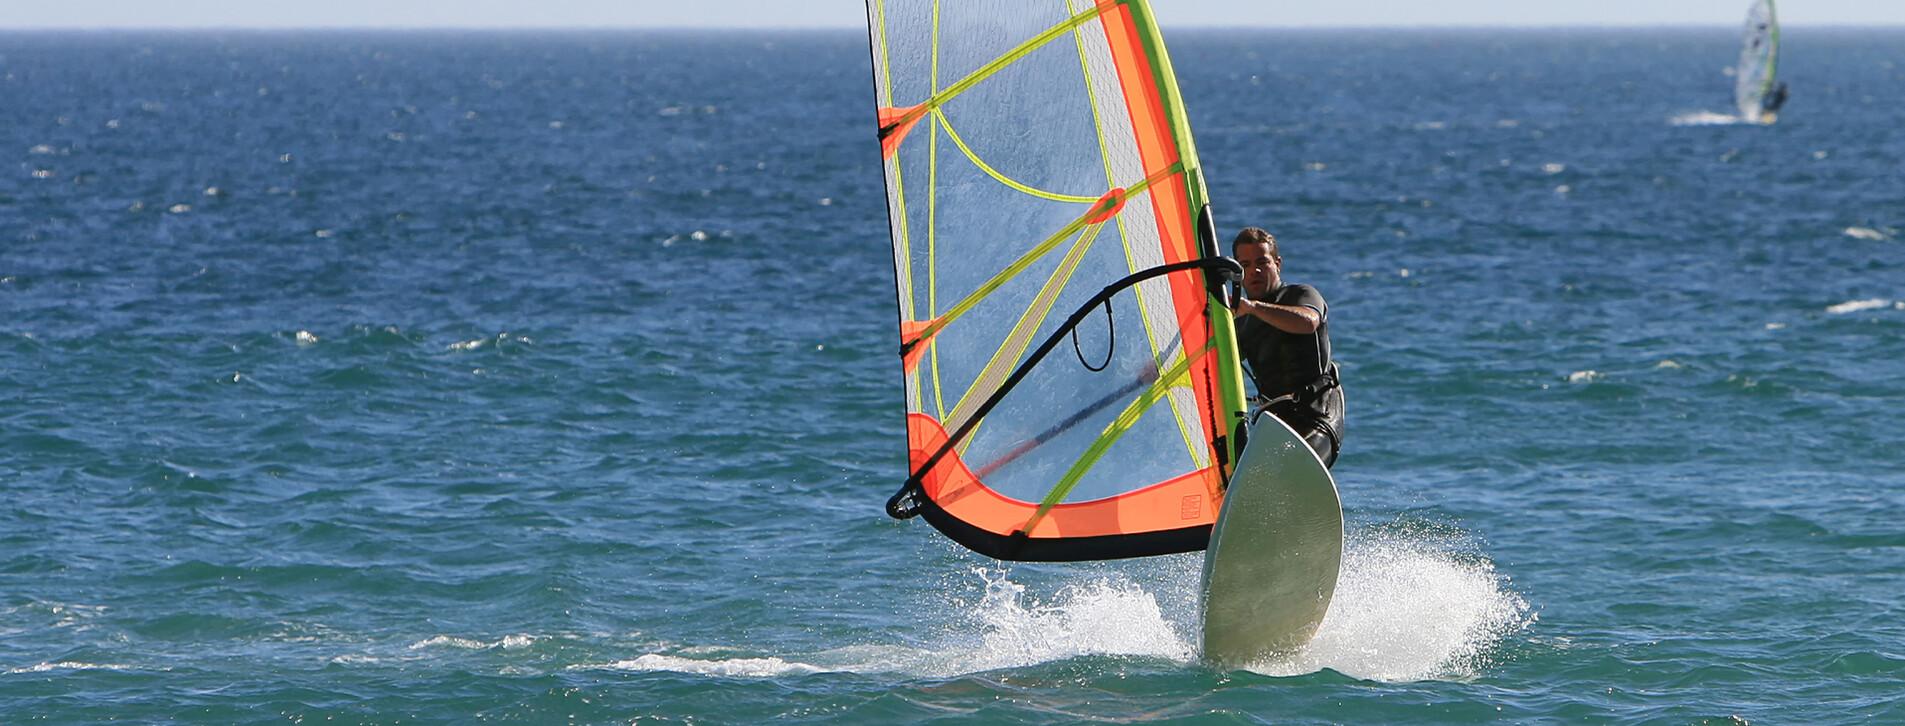 Fotoğraf 1 - Rüzgar Sörfü Başlangıç Eğitimi